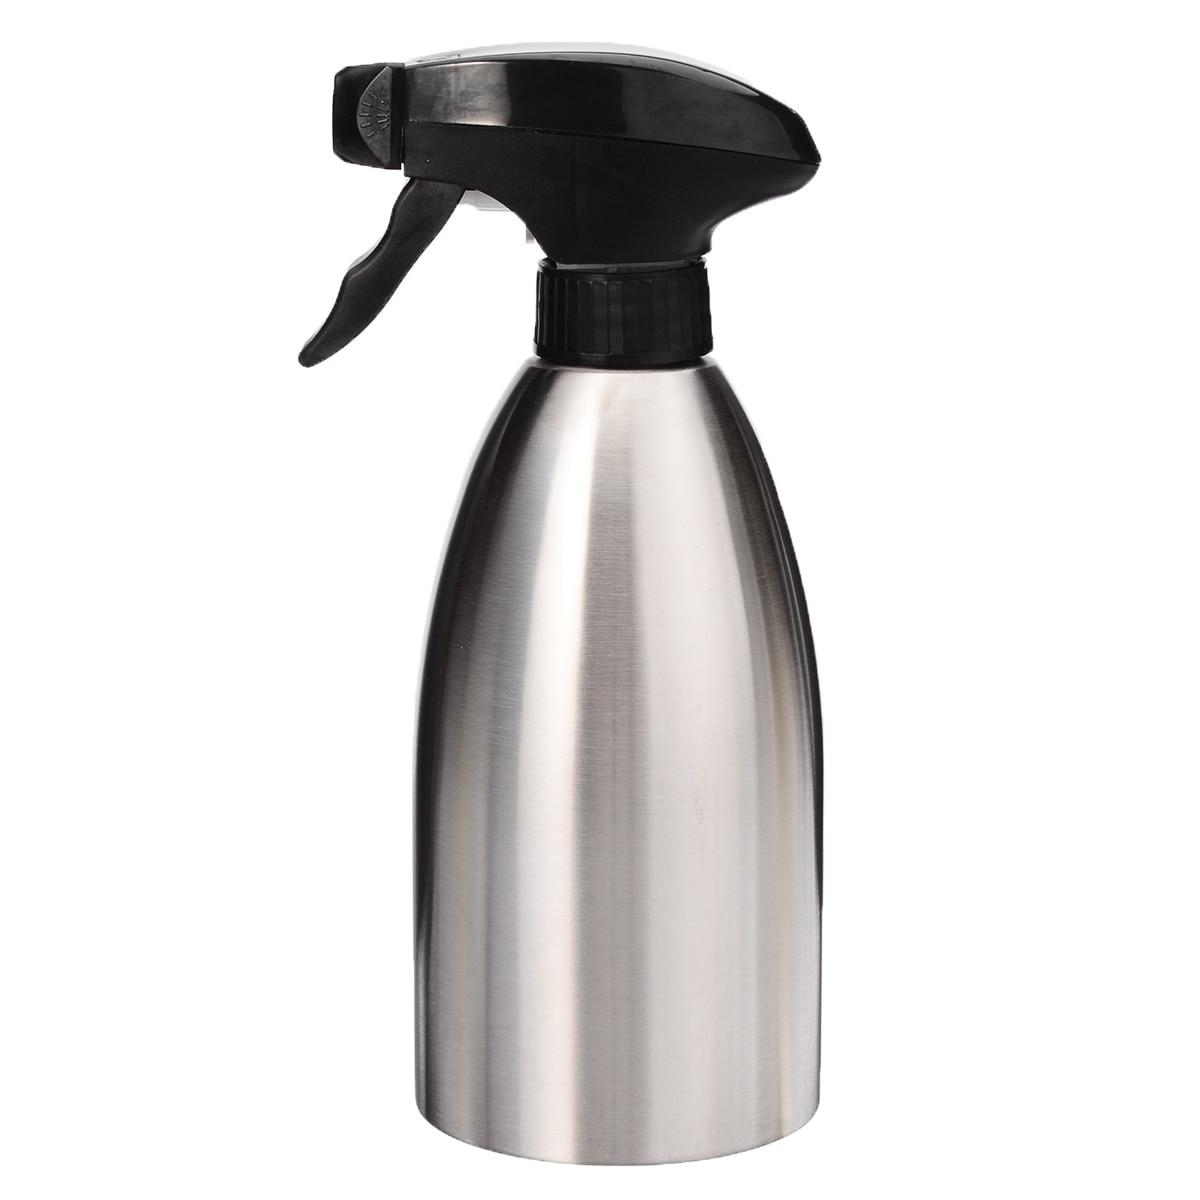 Stainless Steel Oil-Spray Bottle Kitchen Olive Oil Sprayer for BBQ Cooking 500ml